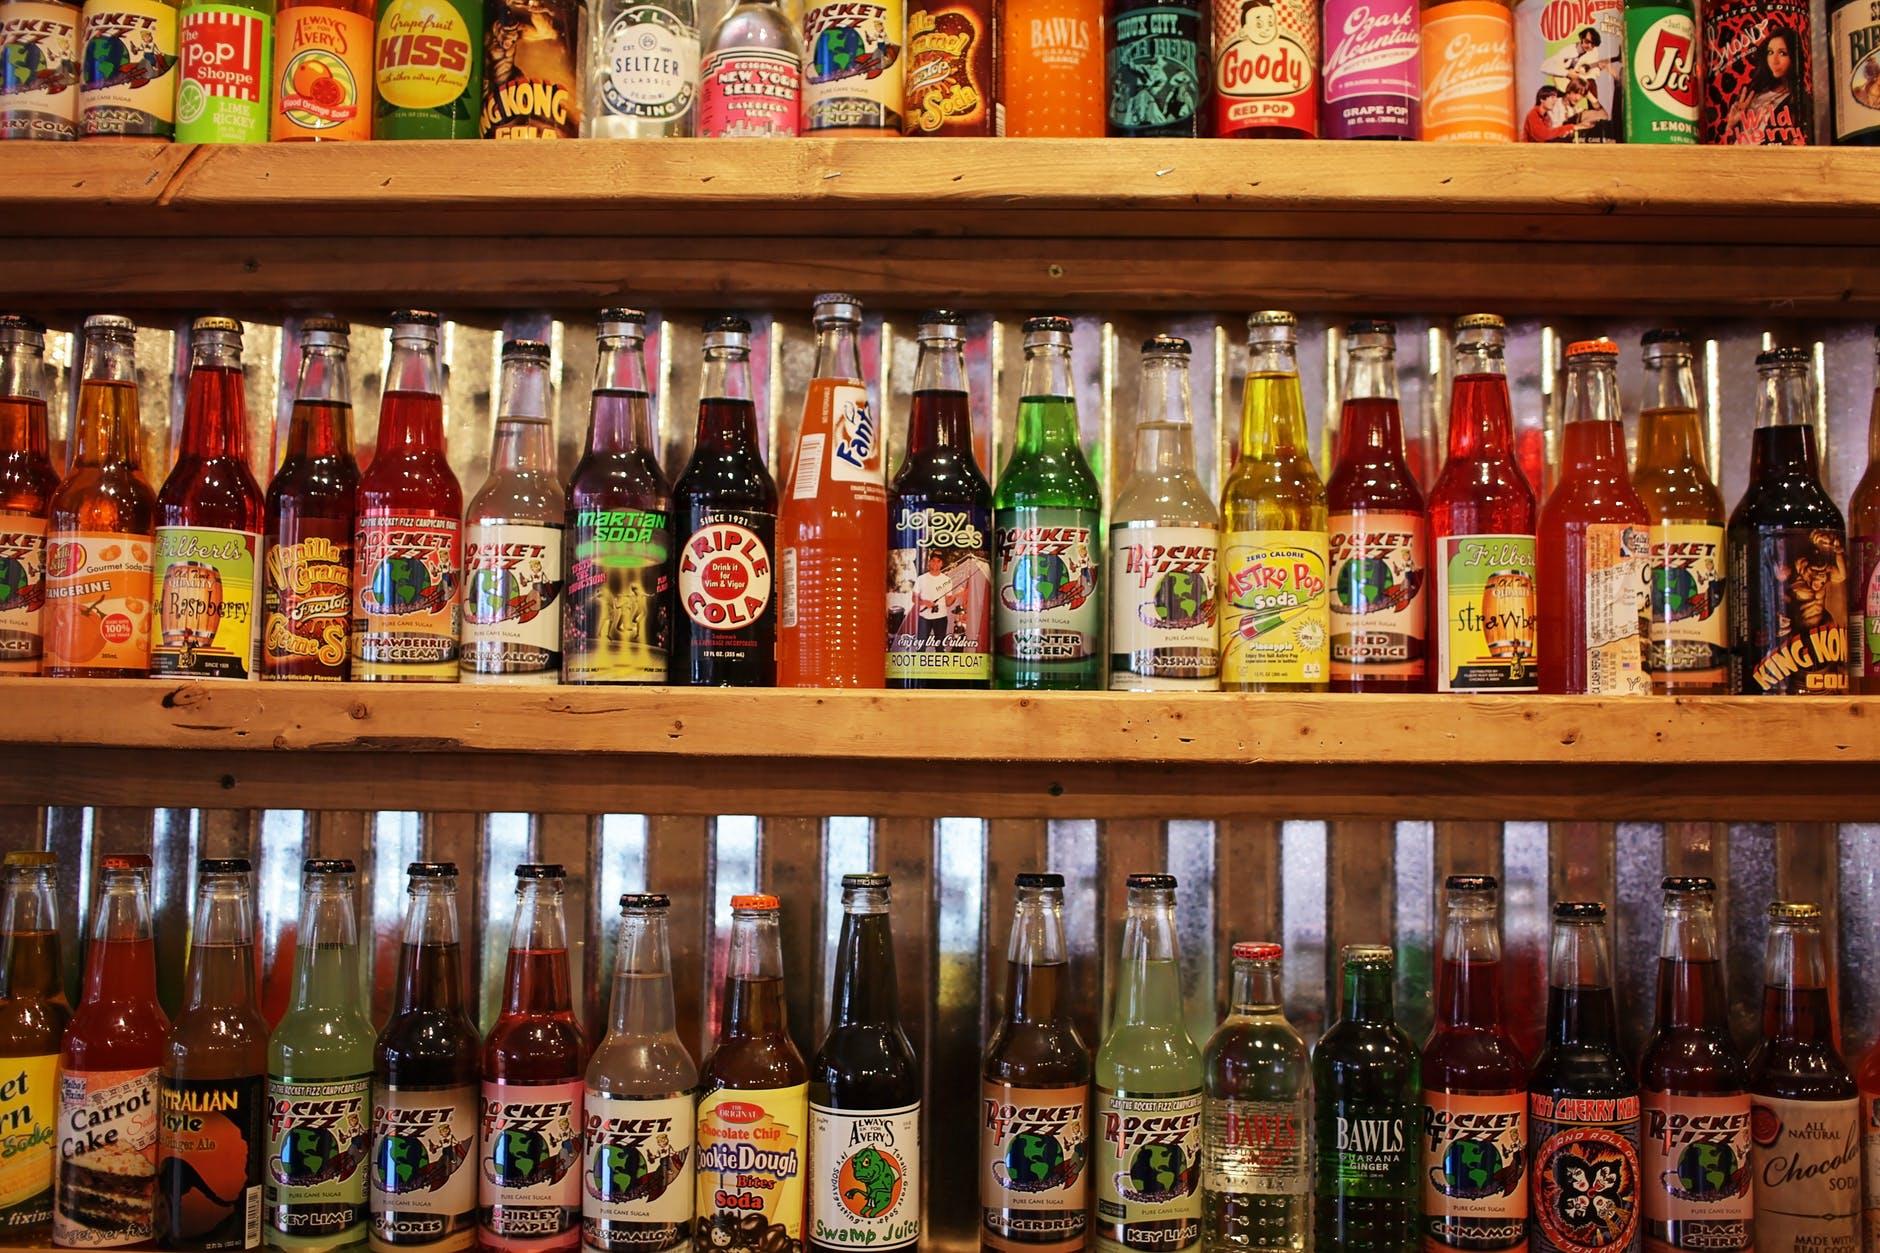 colorful bottles of soda pop on store shelf